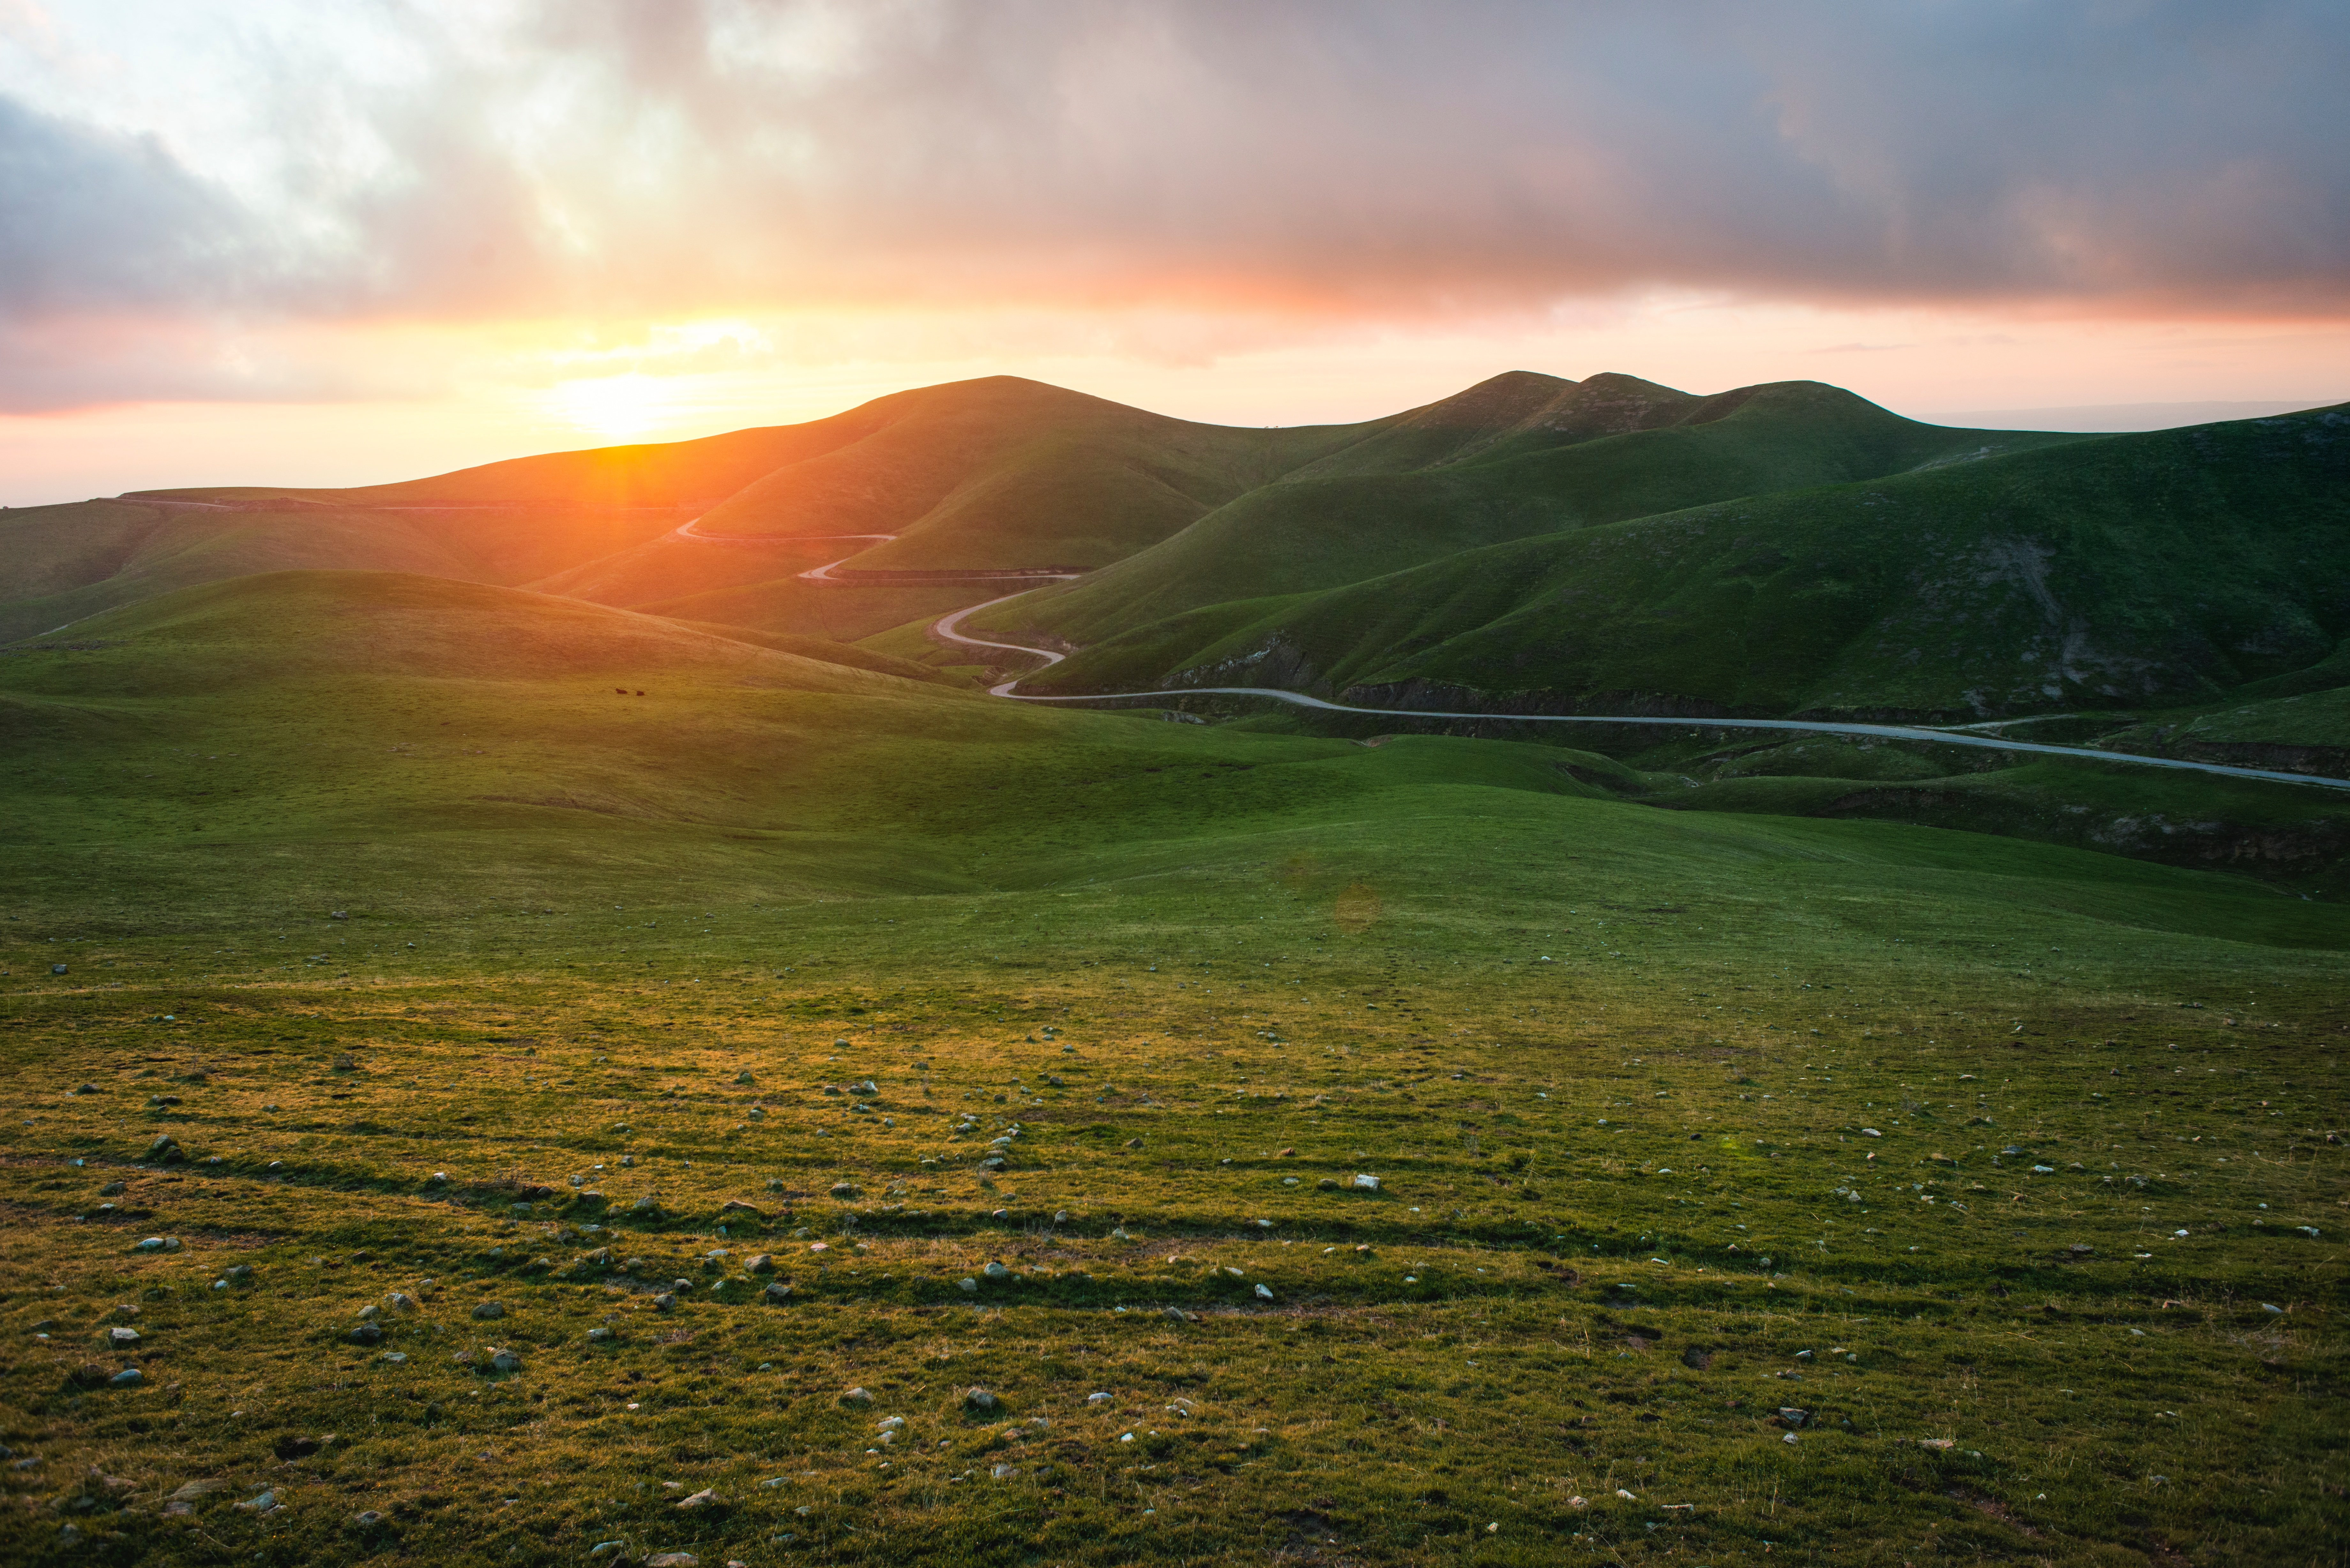 Download wallpaper 7360x4912 valley grass sunset path hd background 7360x4912